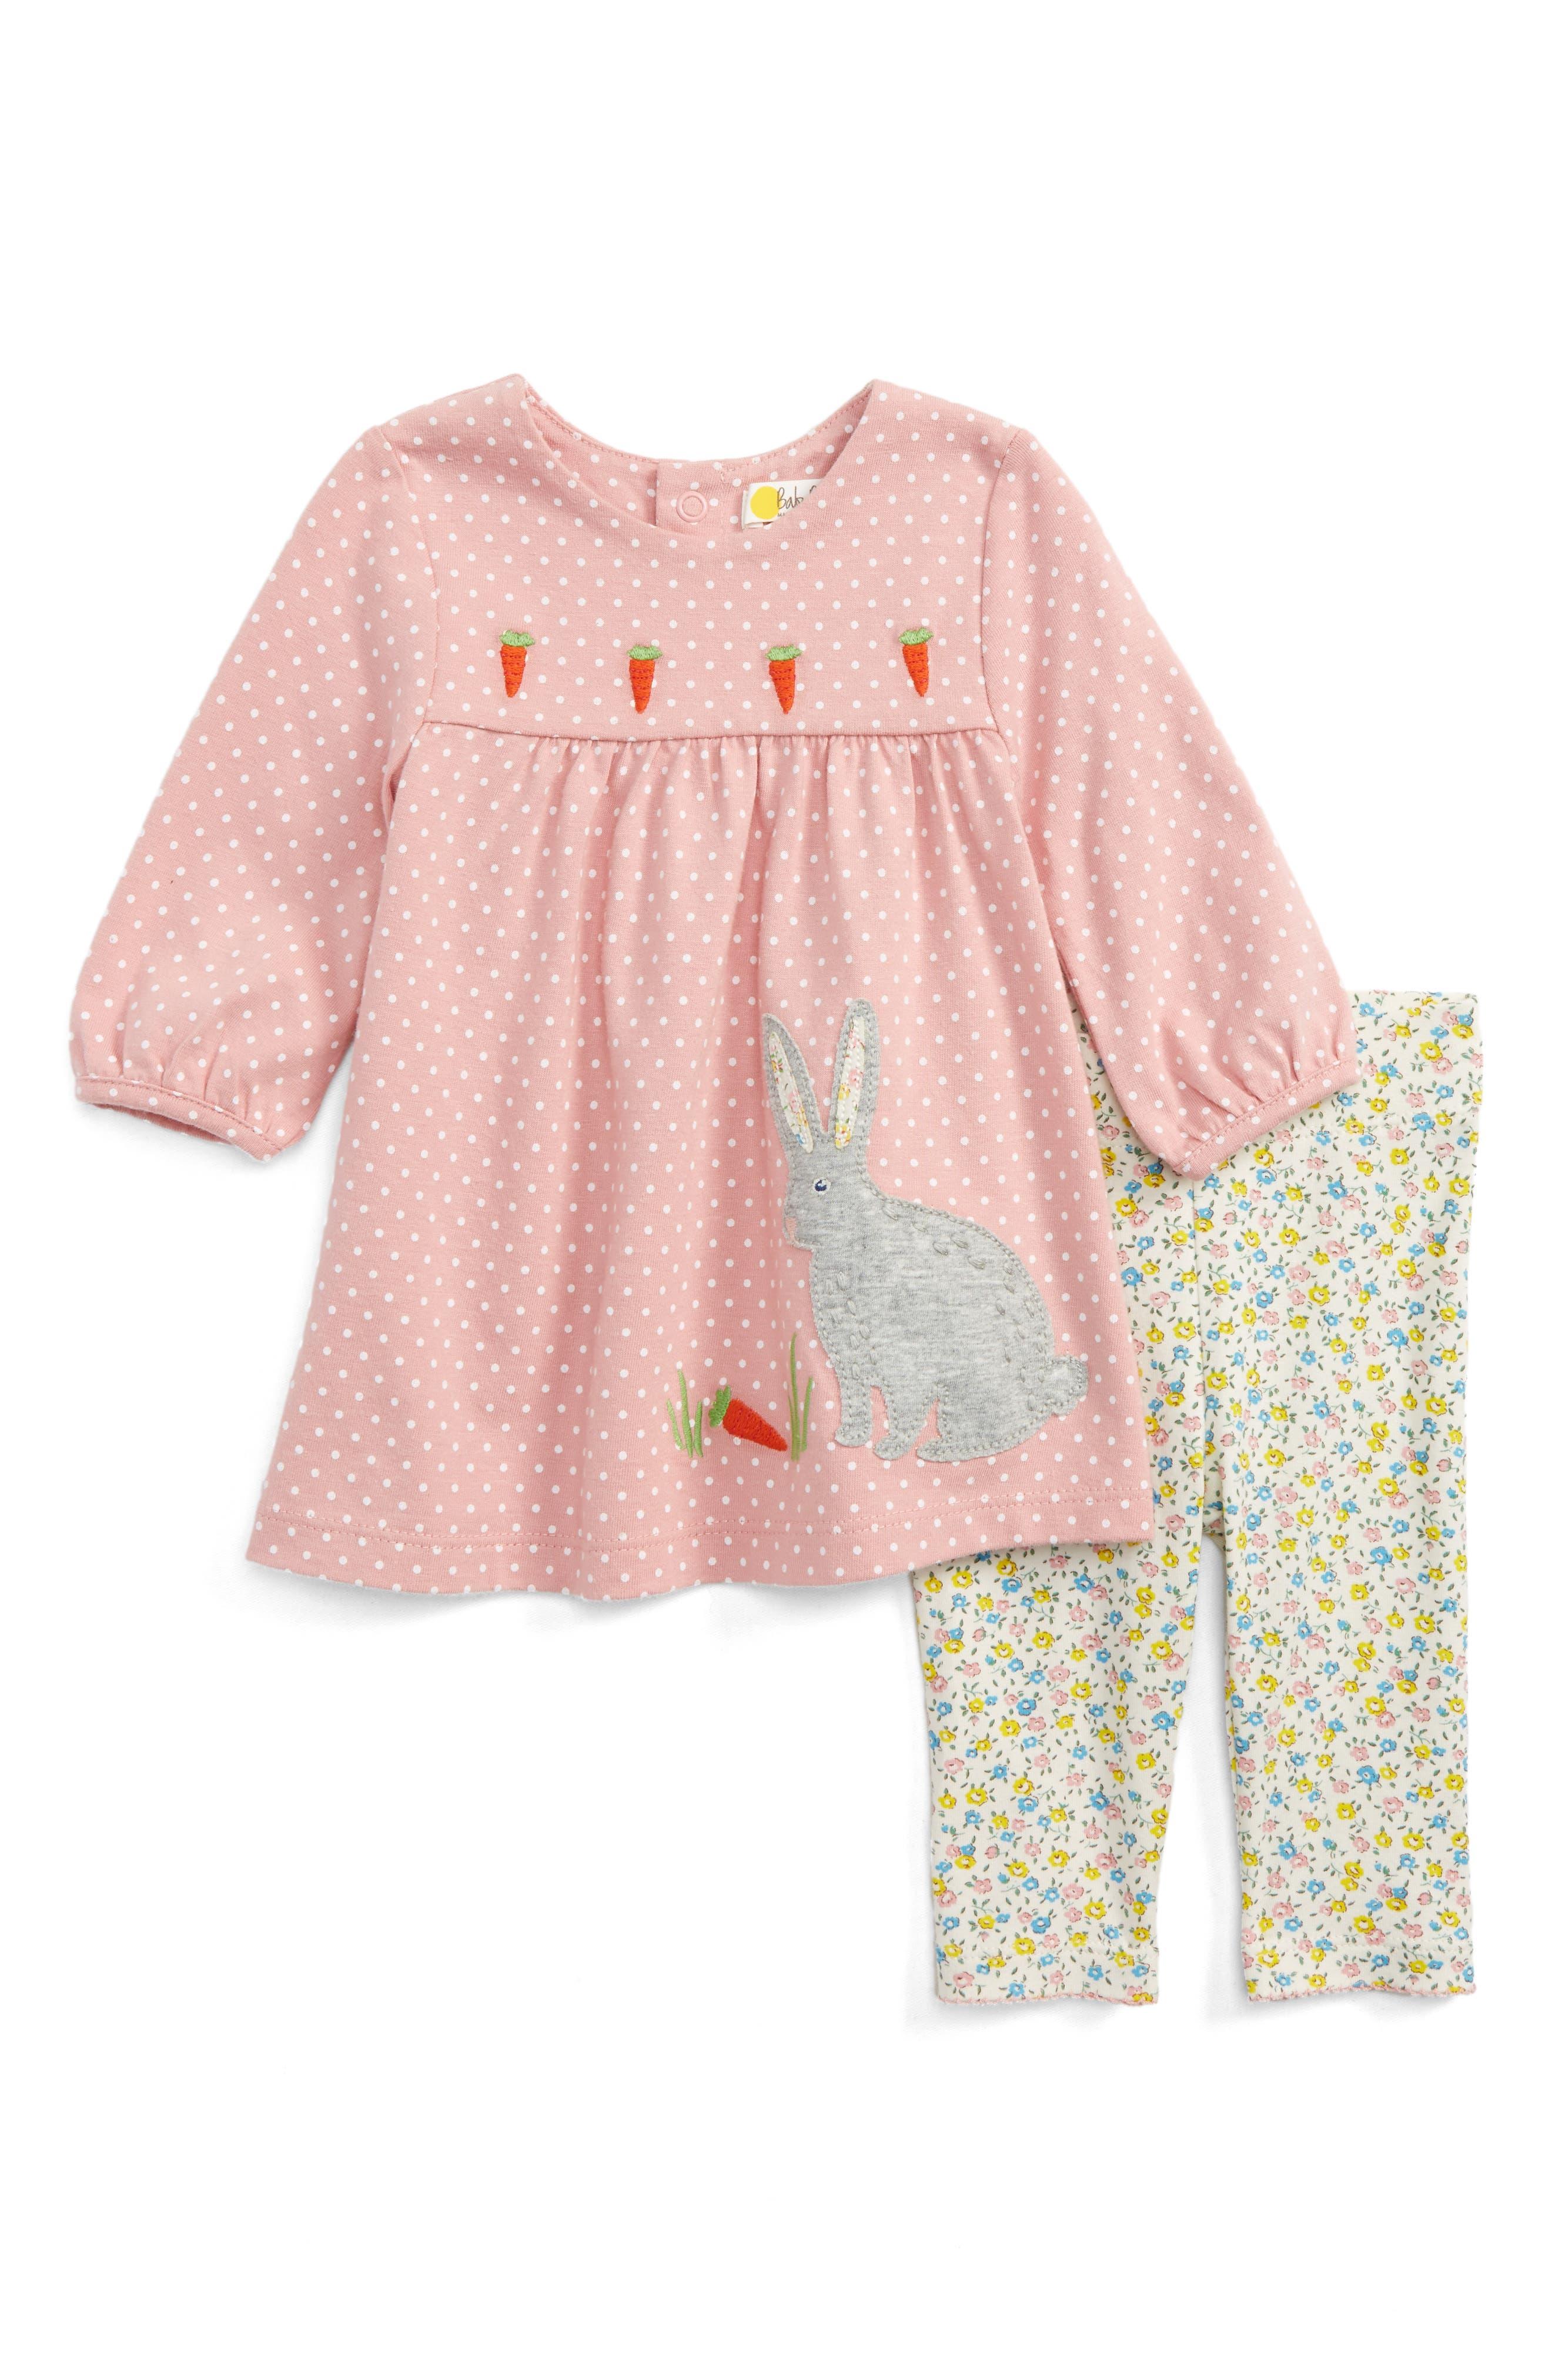 Appliqué Dress & Leggings Set,                             Main thumbnail 1, color,                             Almond Blossom Pink Pin Spot